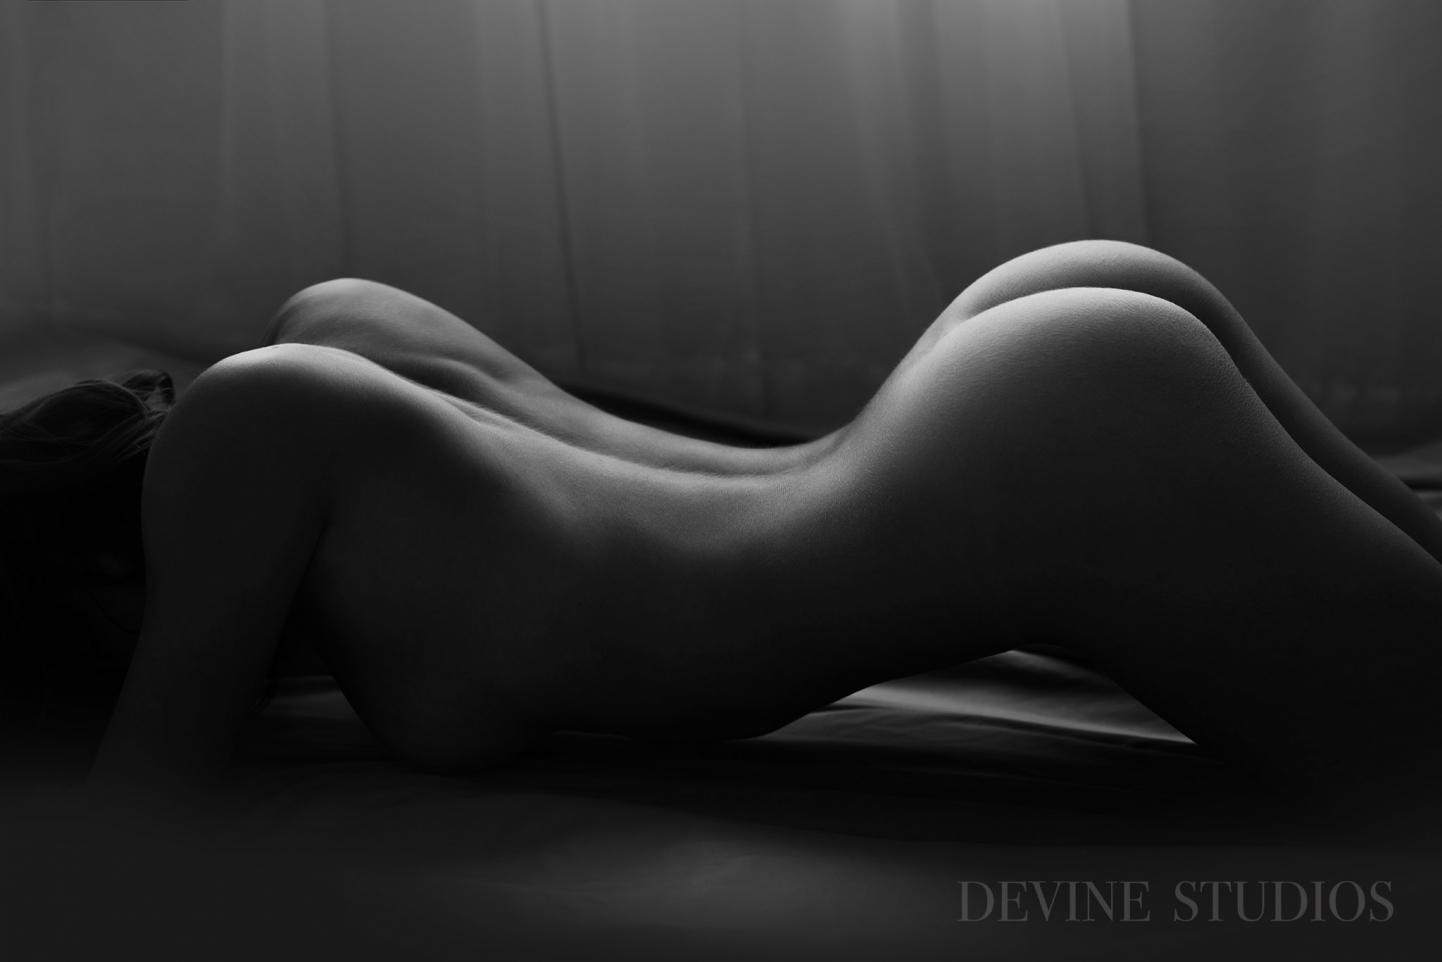 http://devinestudios.com/boudoir/wp-content/uploads/2016/11/Best-boudoir-kansas-city-missouri-photographer-5(pp_w1442_h962).jpg